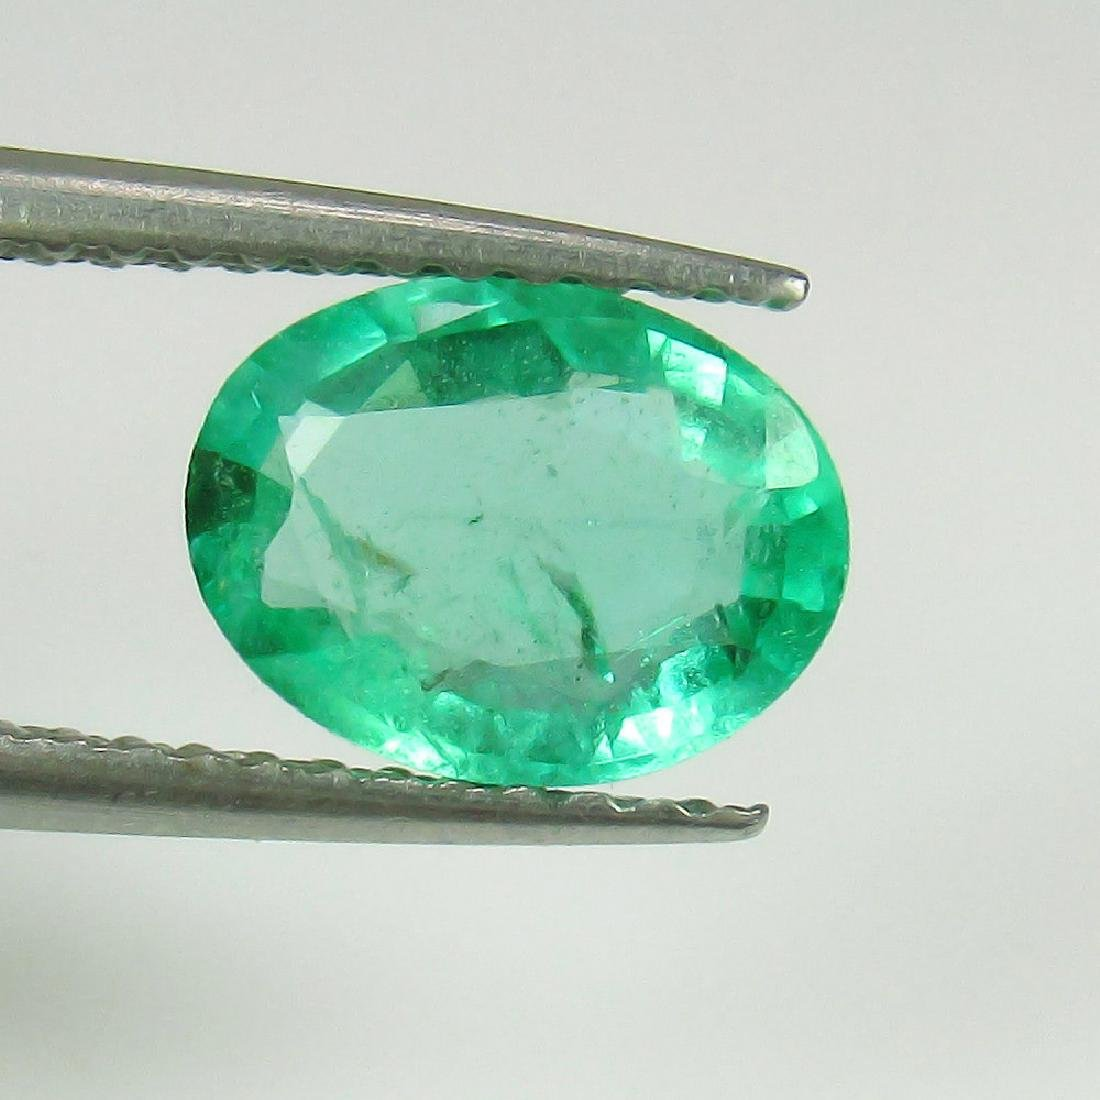 1.23 Ct Genuine Loose Zambian Emerald Nice Oval cut Top